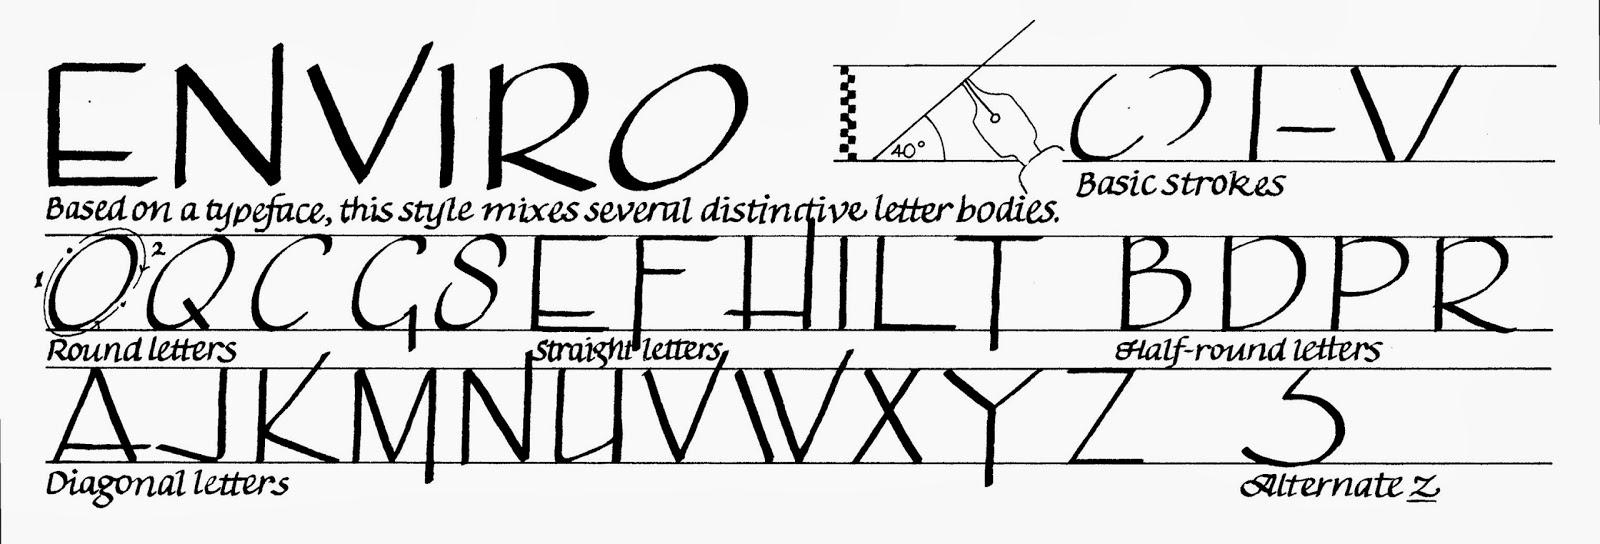 Margaret Shepherd: Calligraphy Blog: 260 Enviro